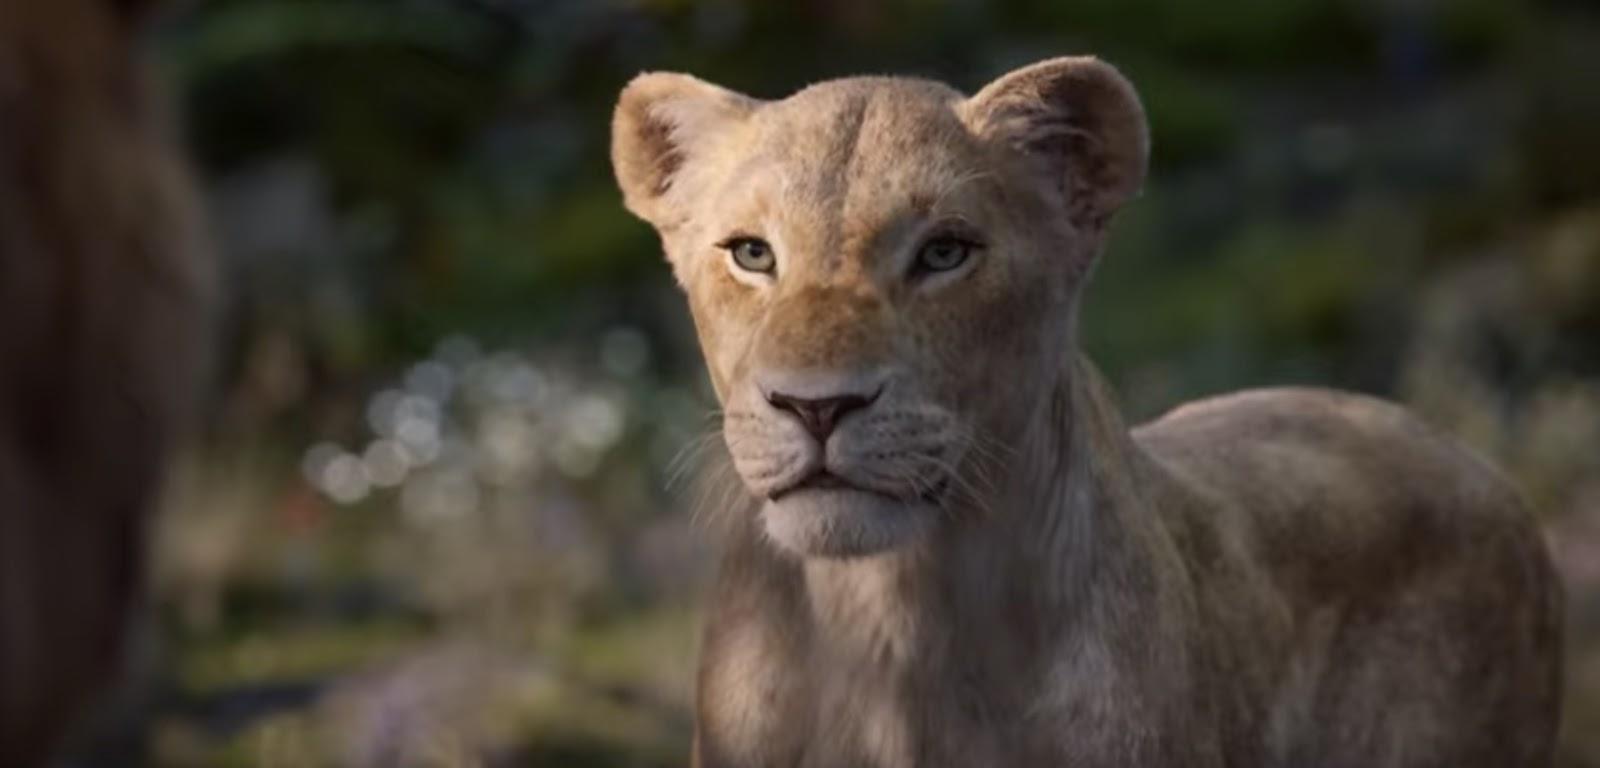 Disney Shares The Lion King Sneak Peek Featuring Beyoncé